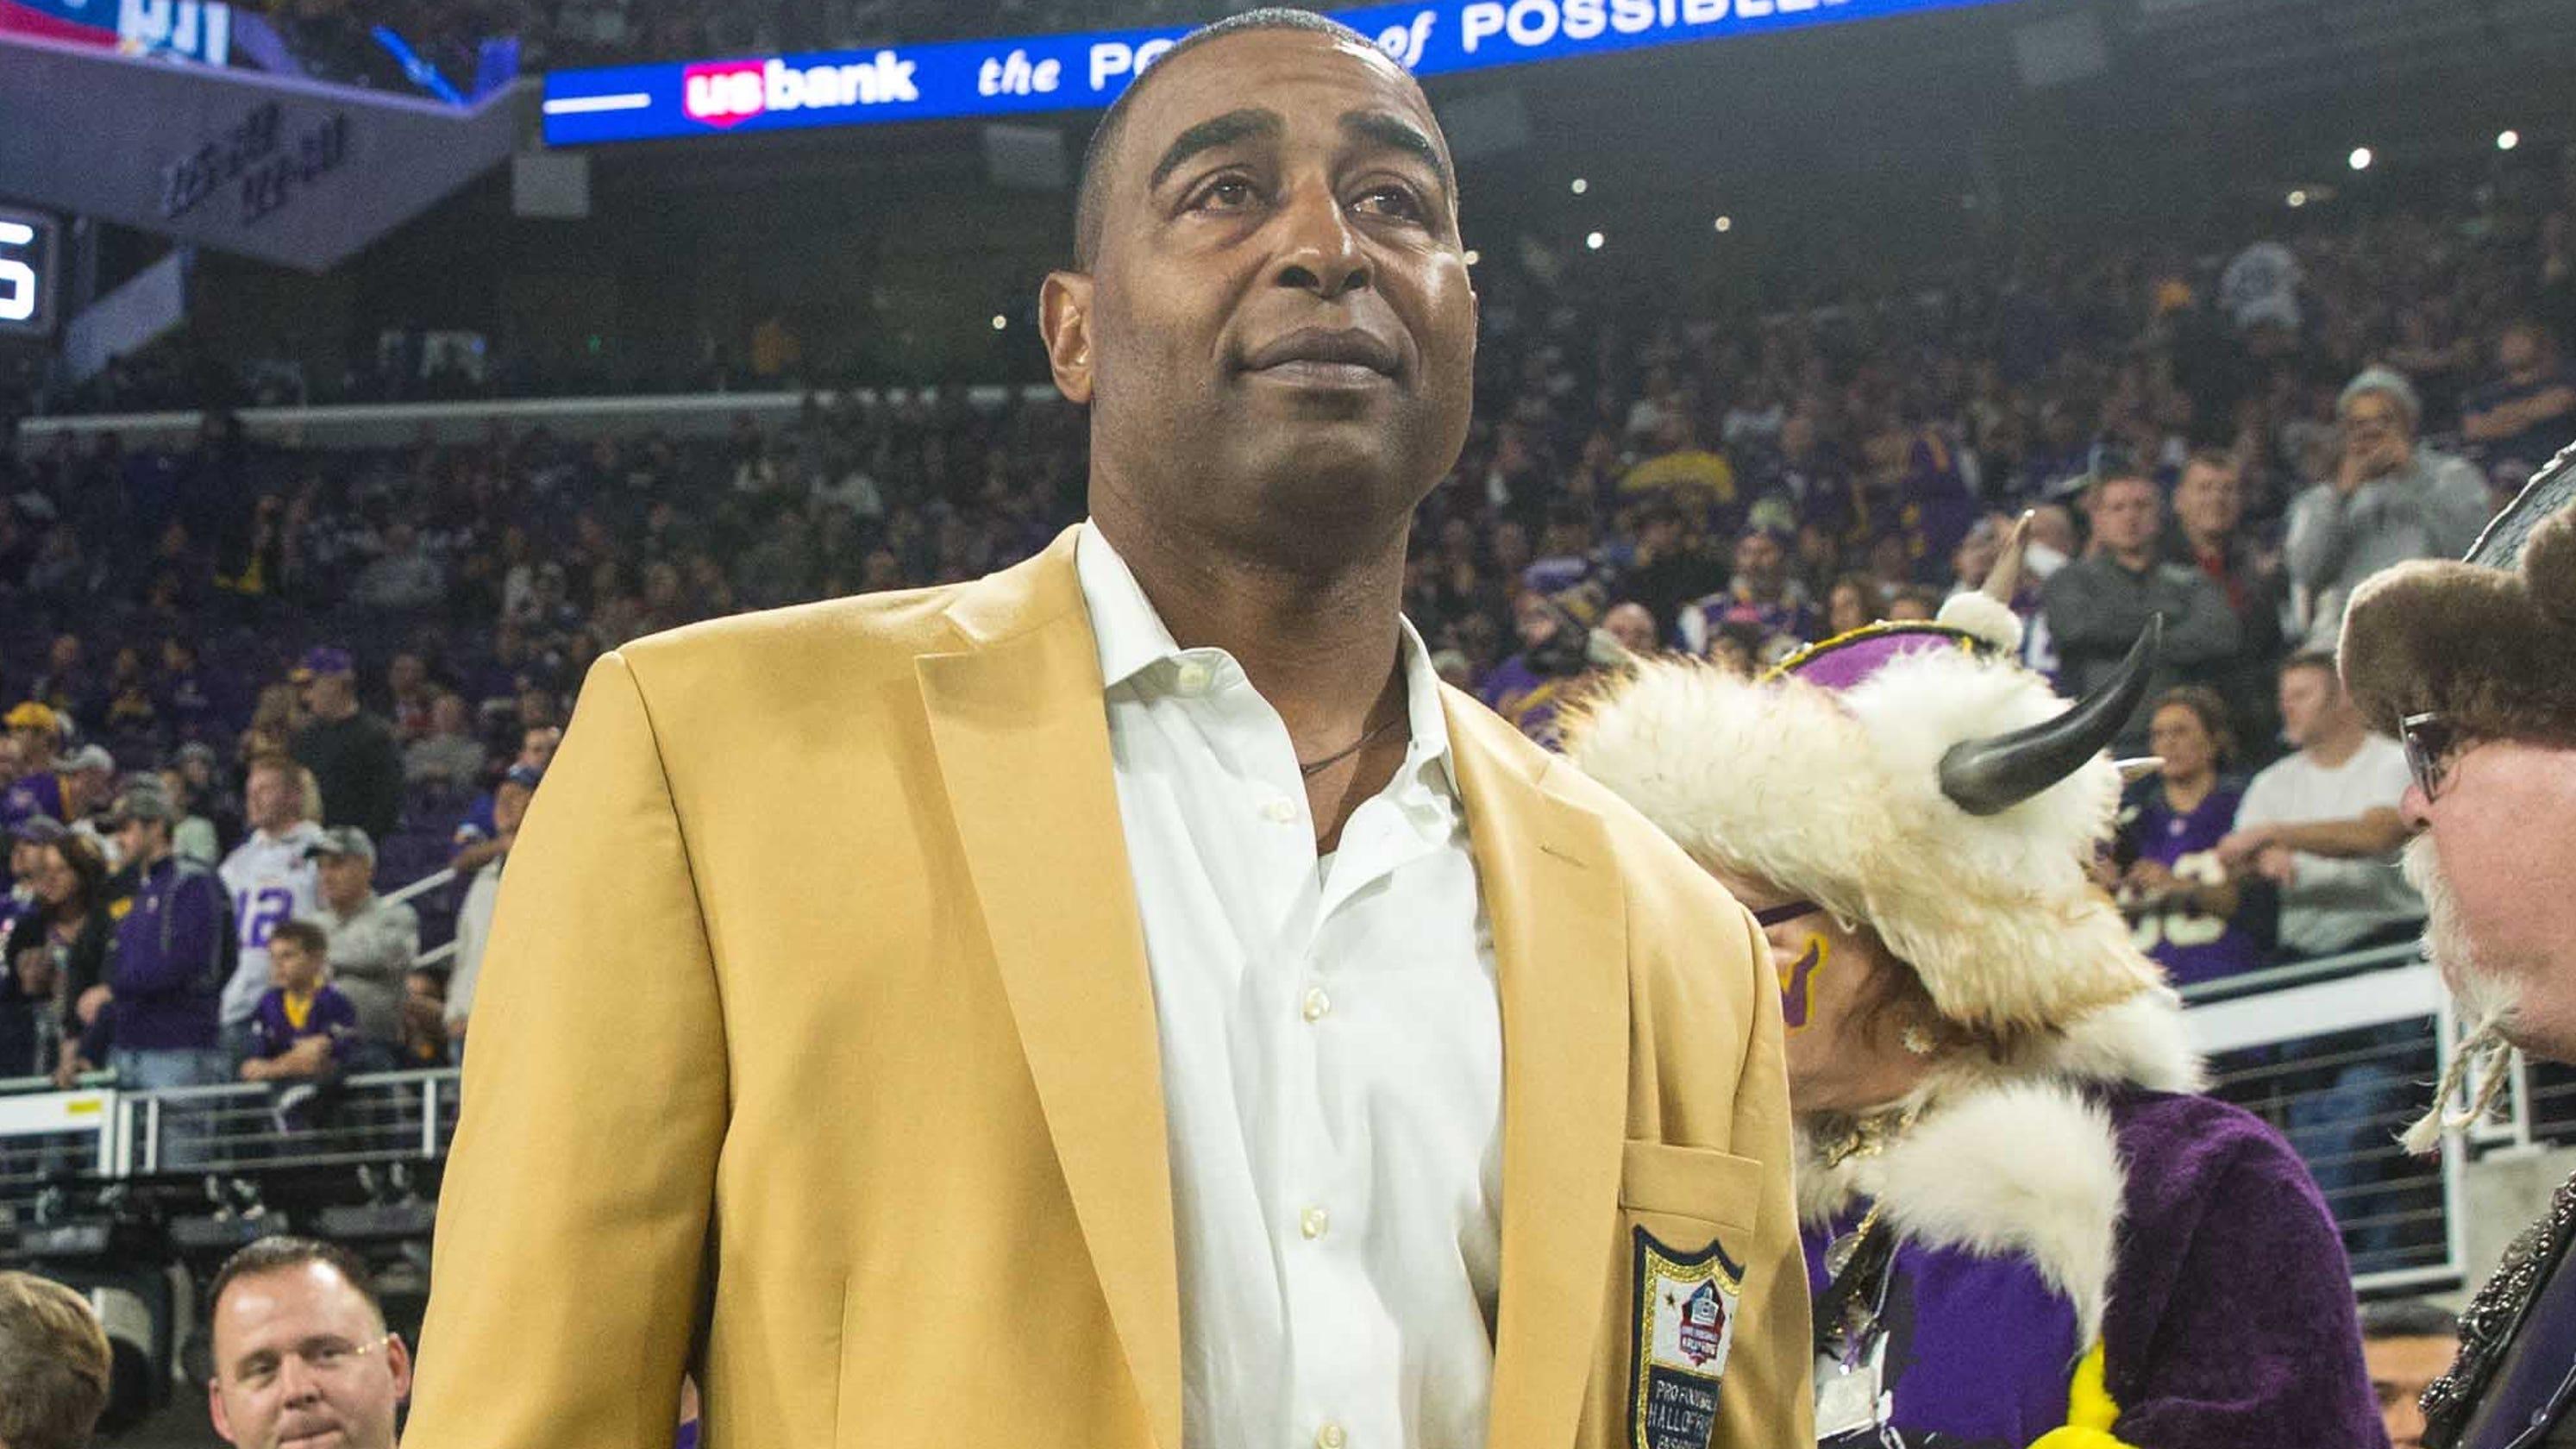 NFL Hall of Famer recalls going hungry; coronavirus pushed him to help